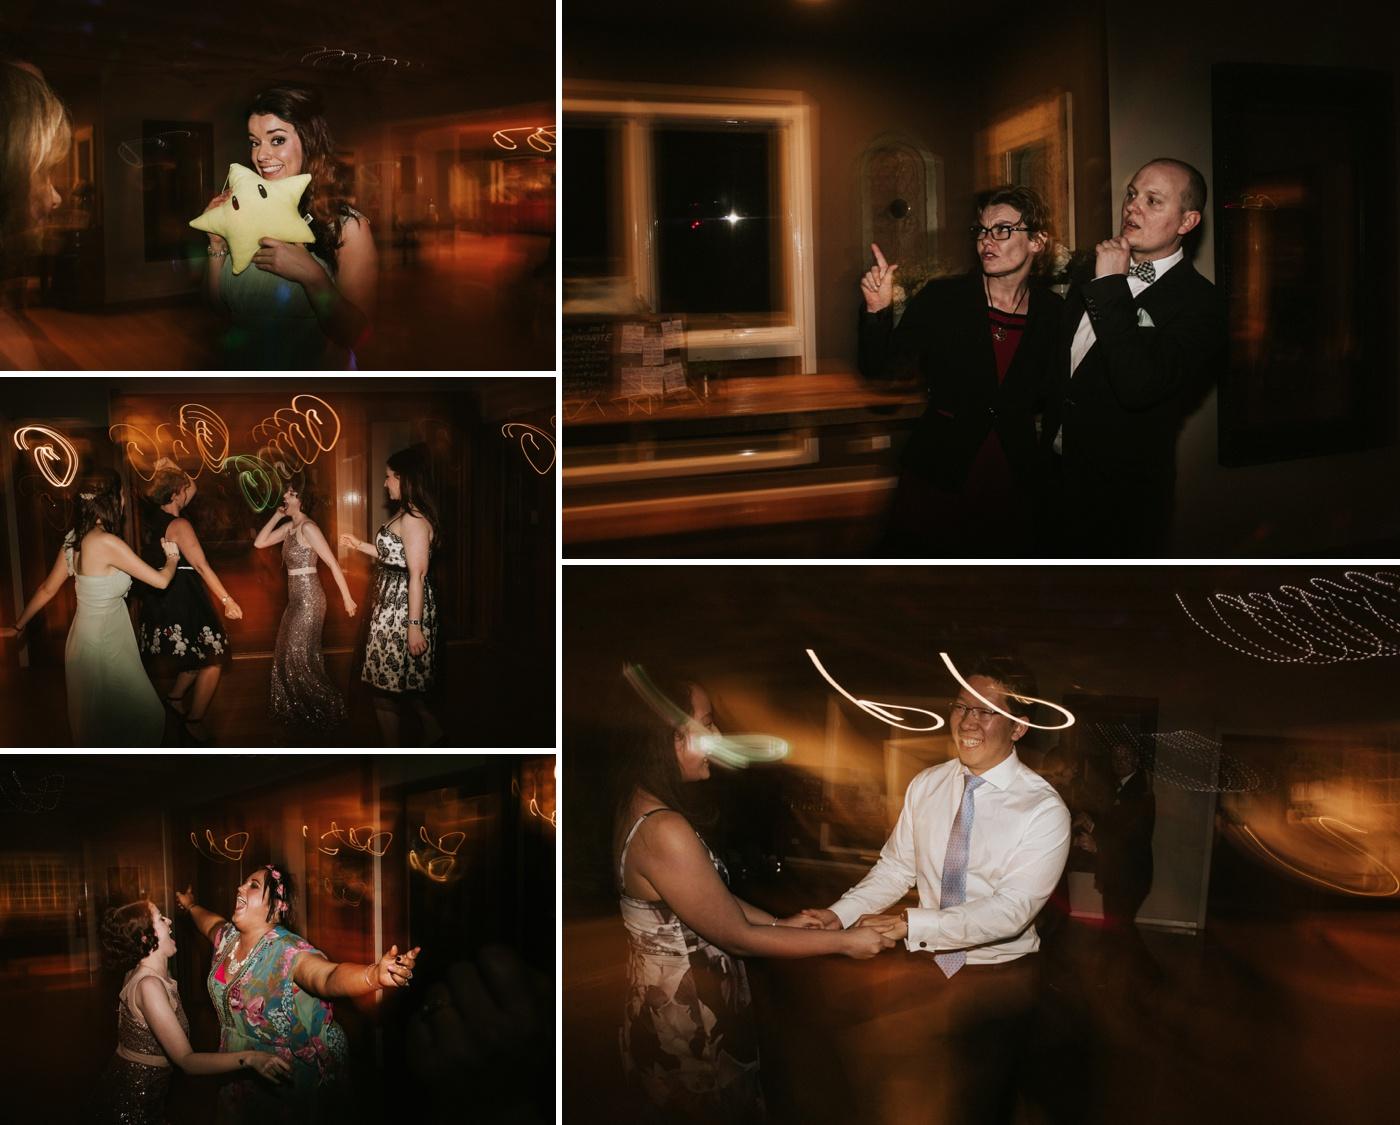 Emma&Morgan_Melbourne-Vintage-Elegant-Fun-Quirky-Yarra-Valley-Vineyard-Wedding_Melbourne-Wedding-Photography-112